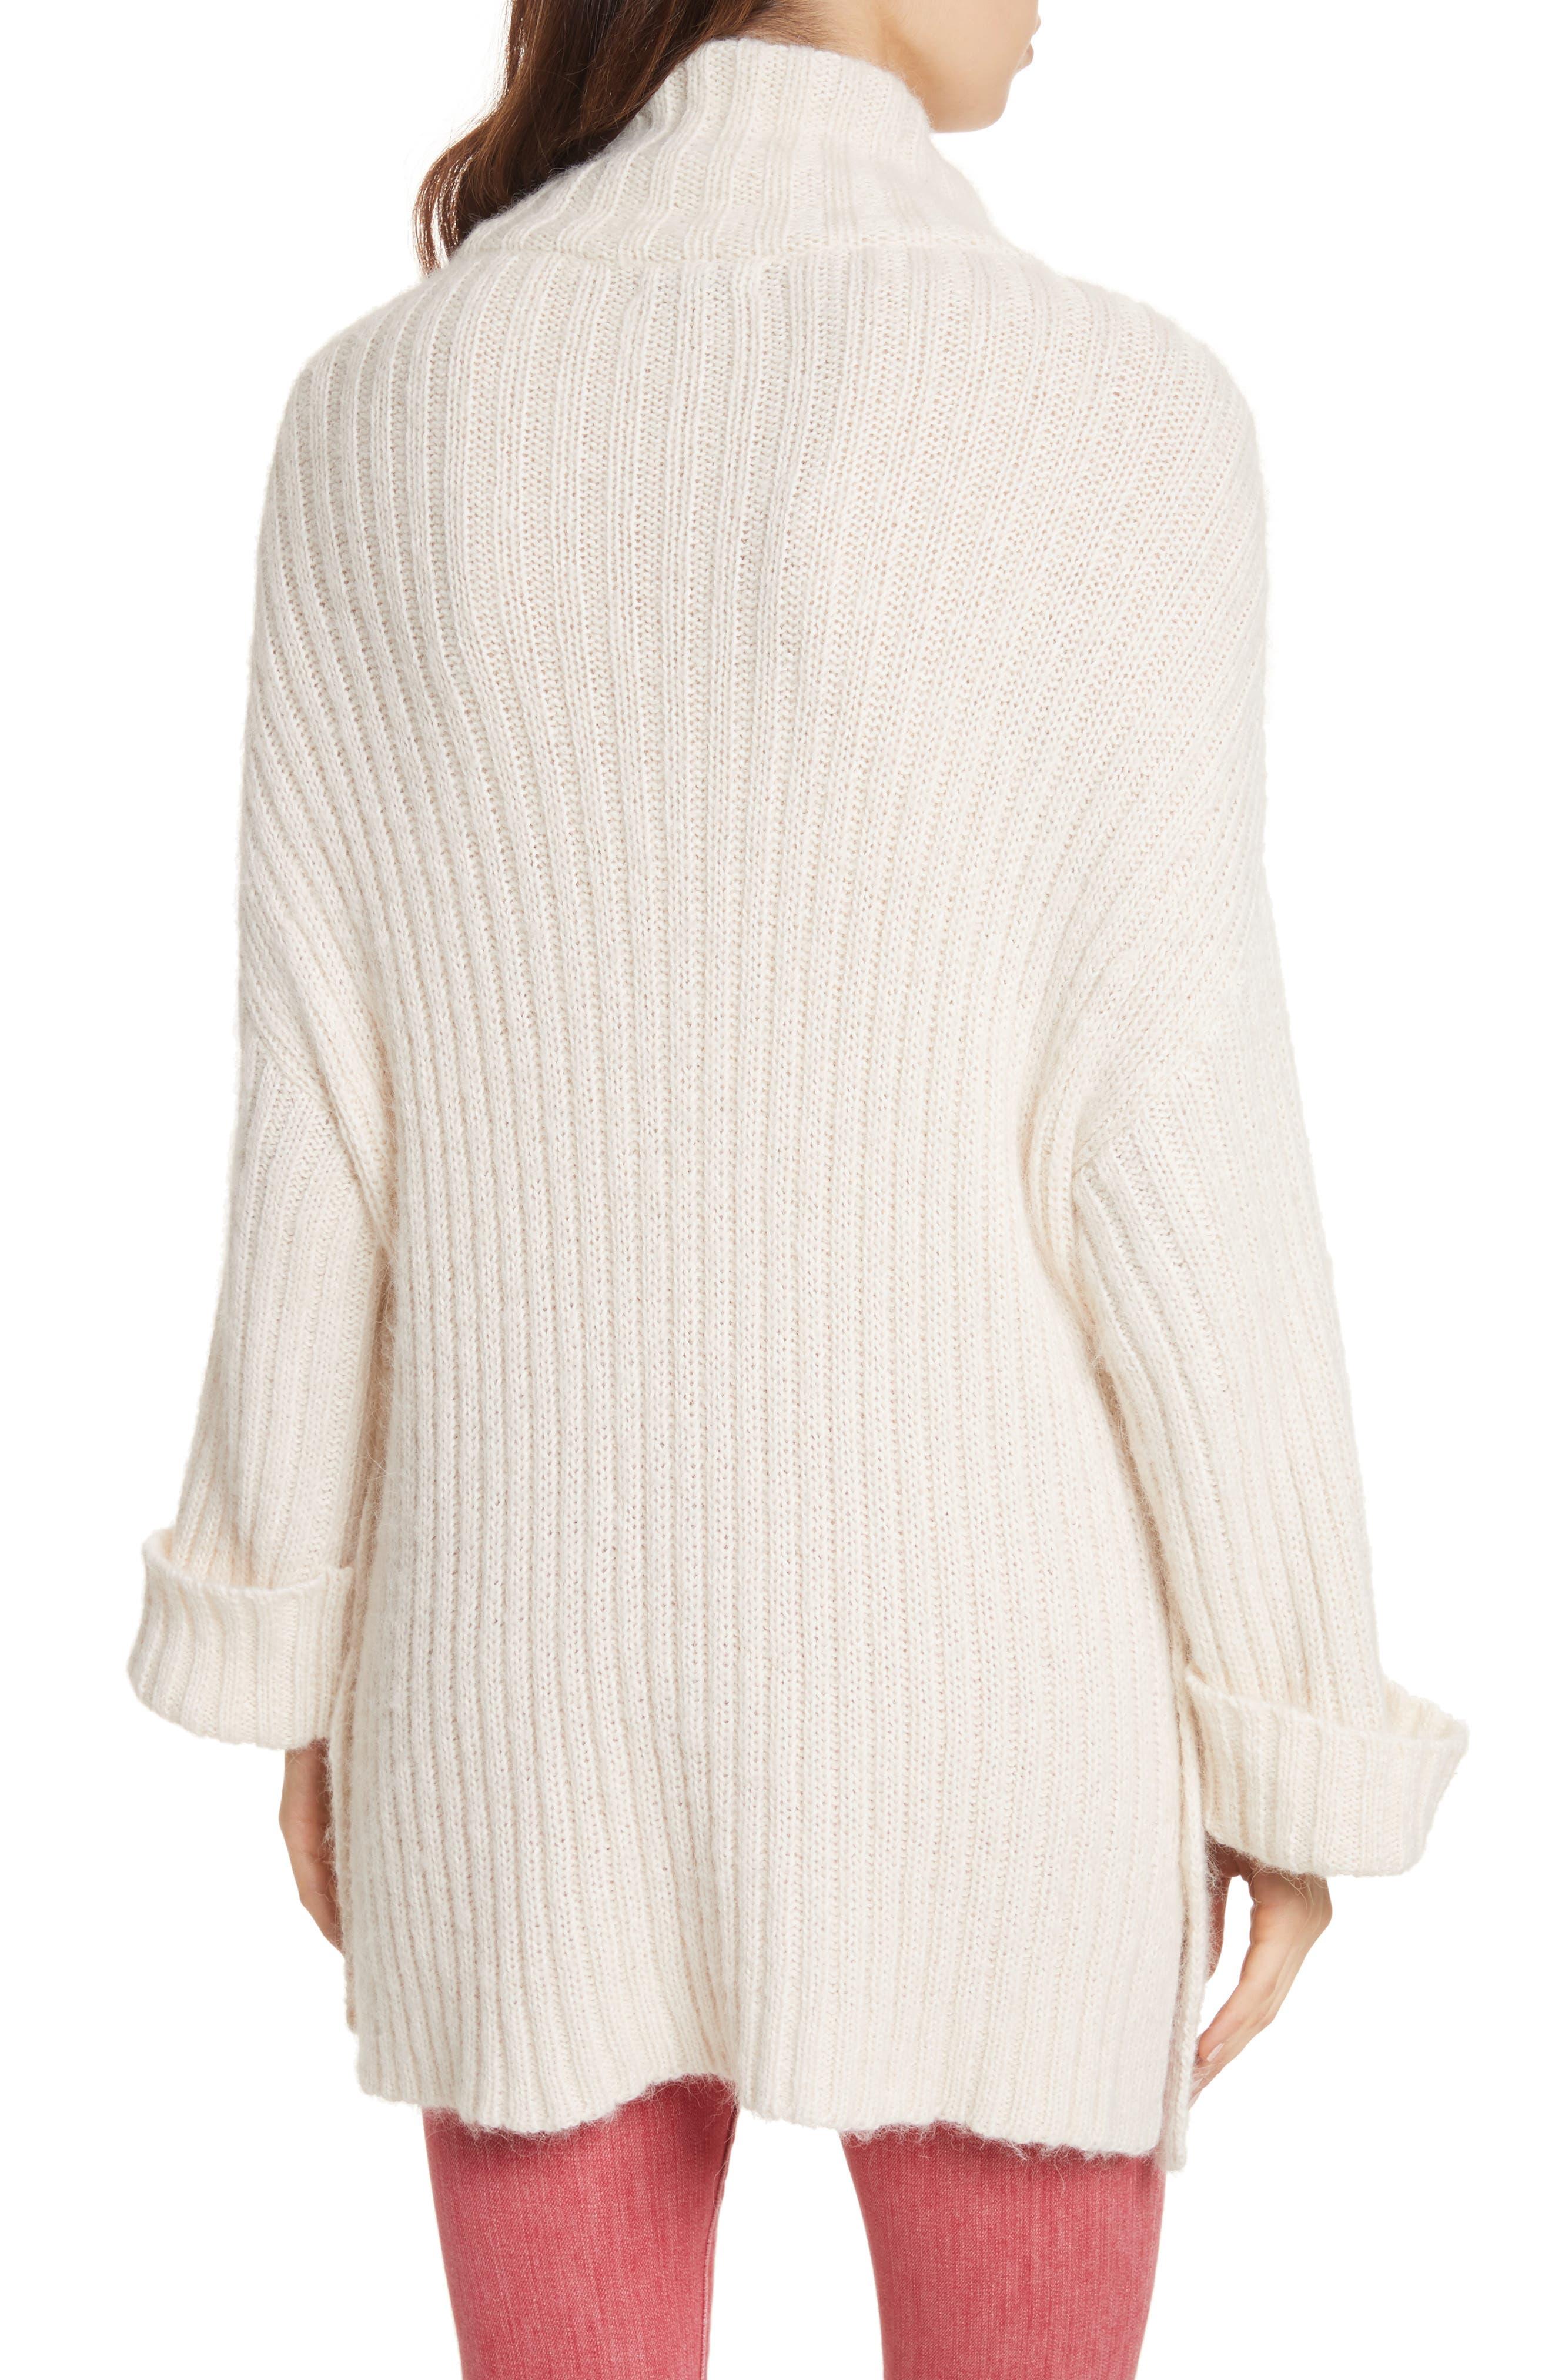 Banain Turtleneck Sweater,                             Alternate thumbnail 2, color,                             114